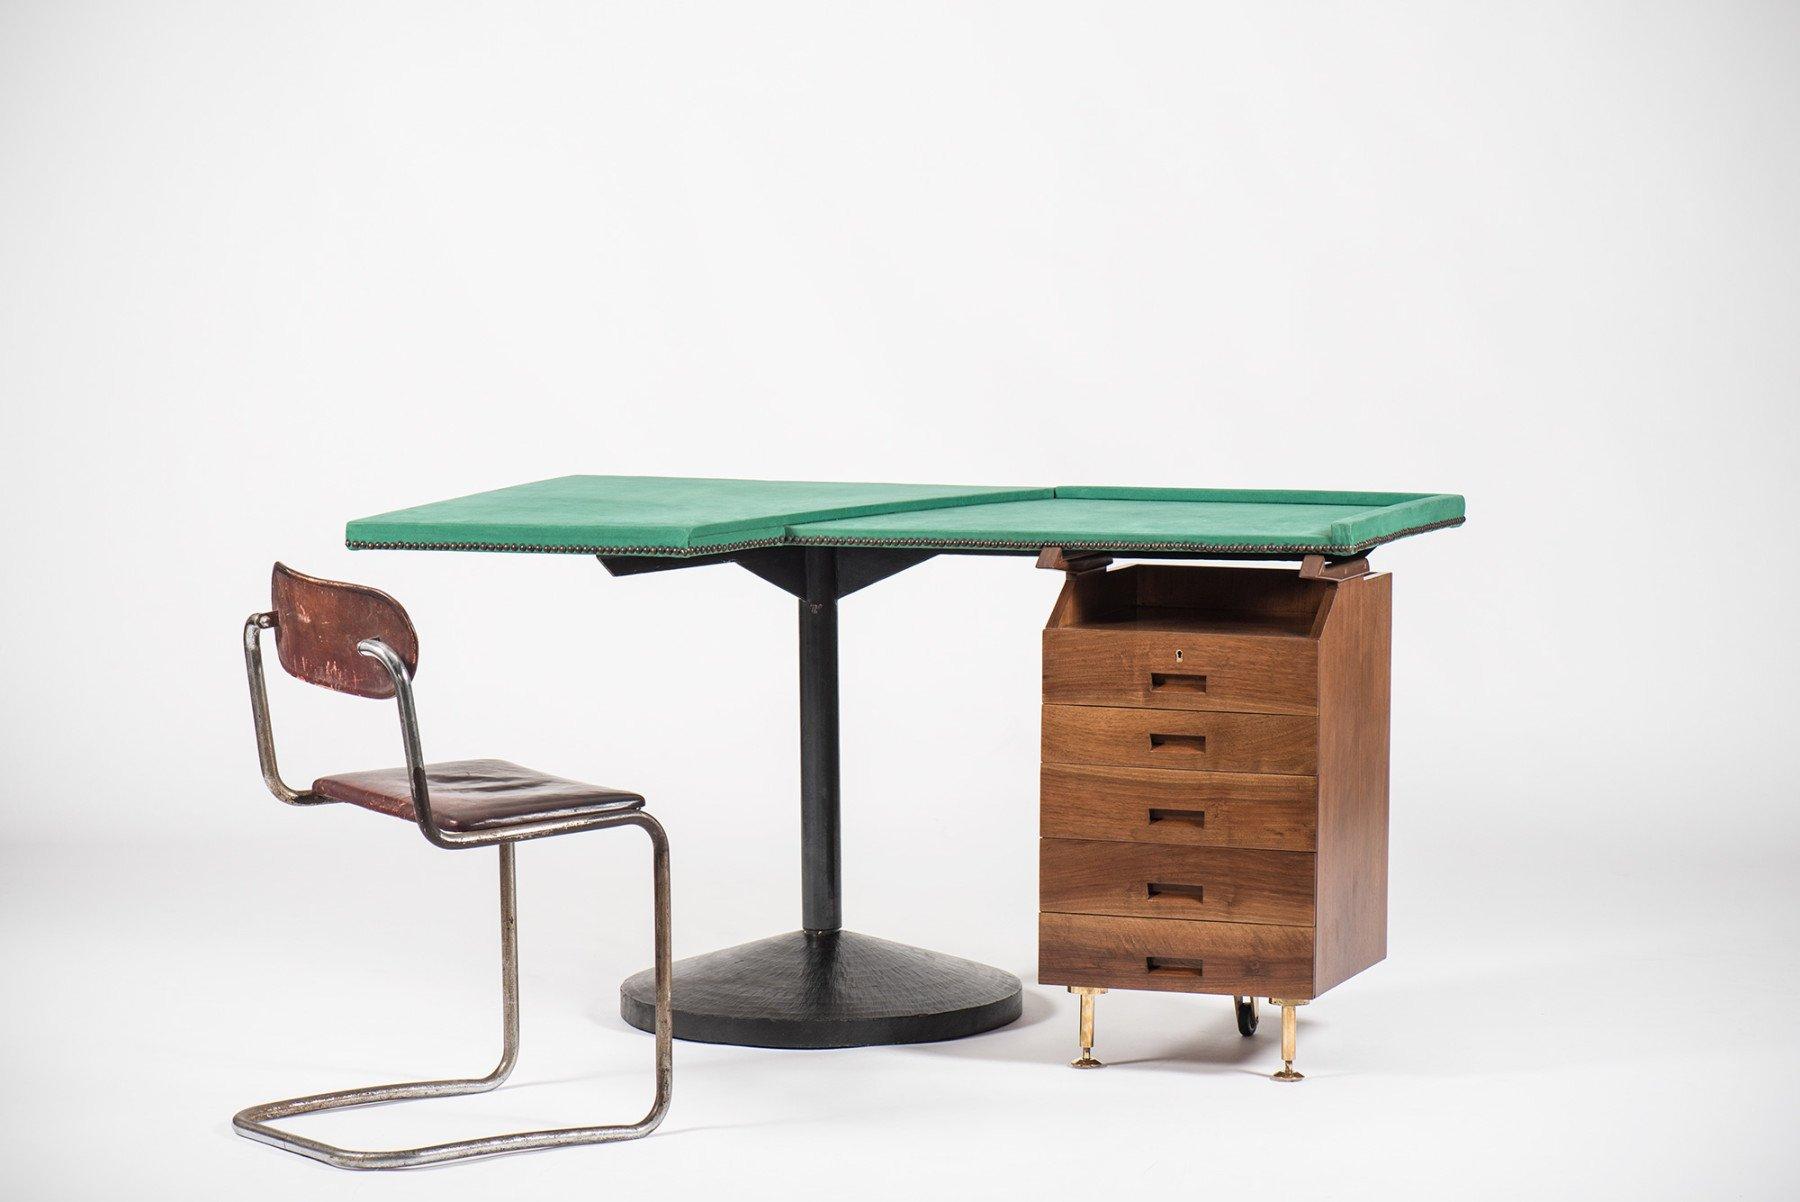 Franco Albini Stadera Sc27 Desk